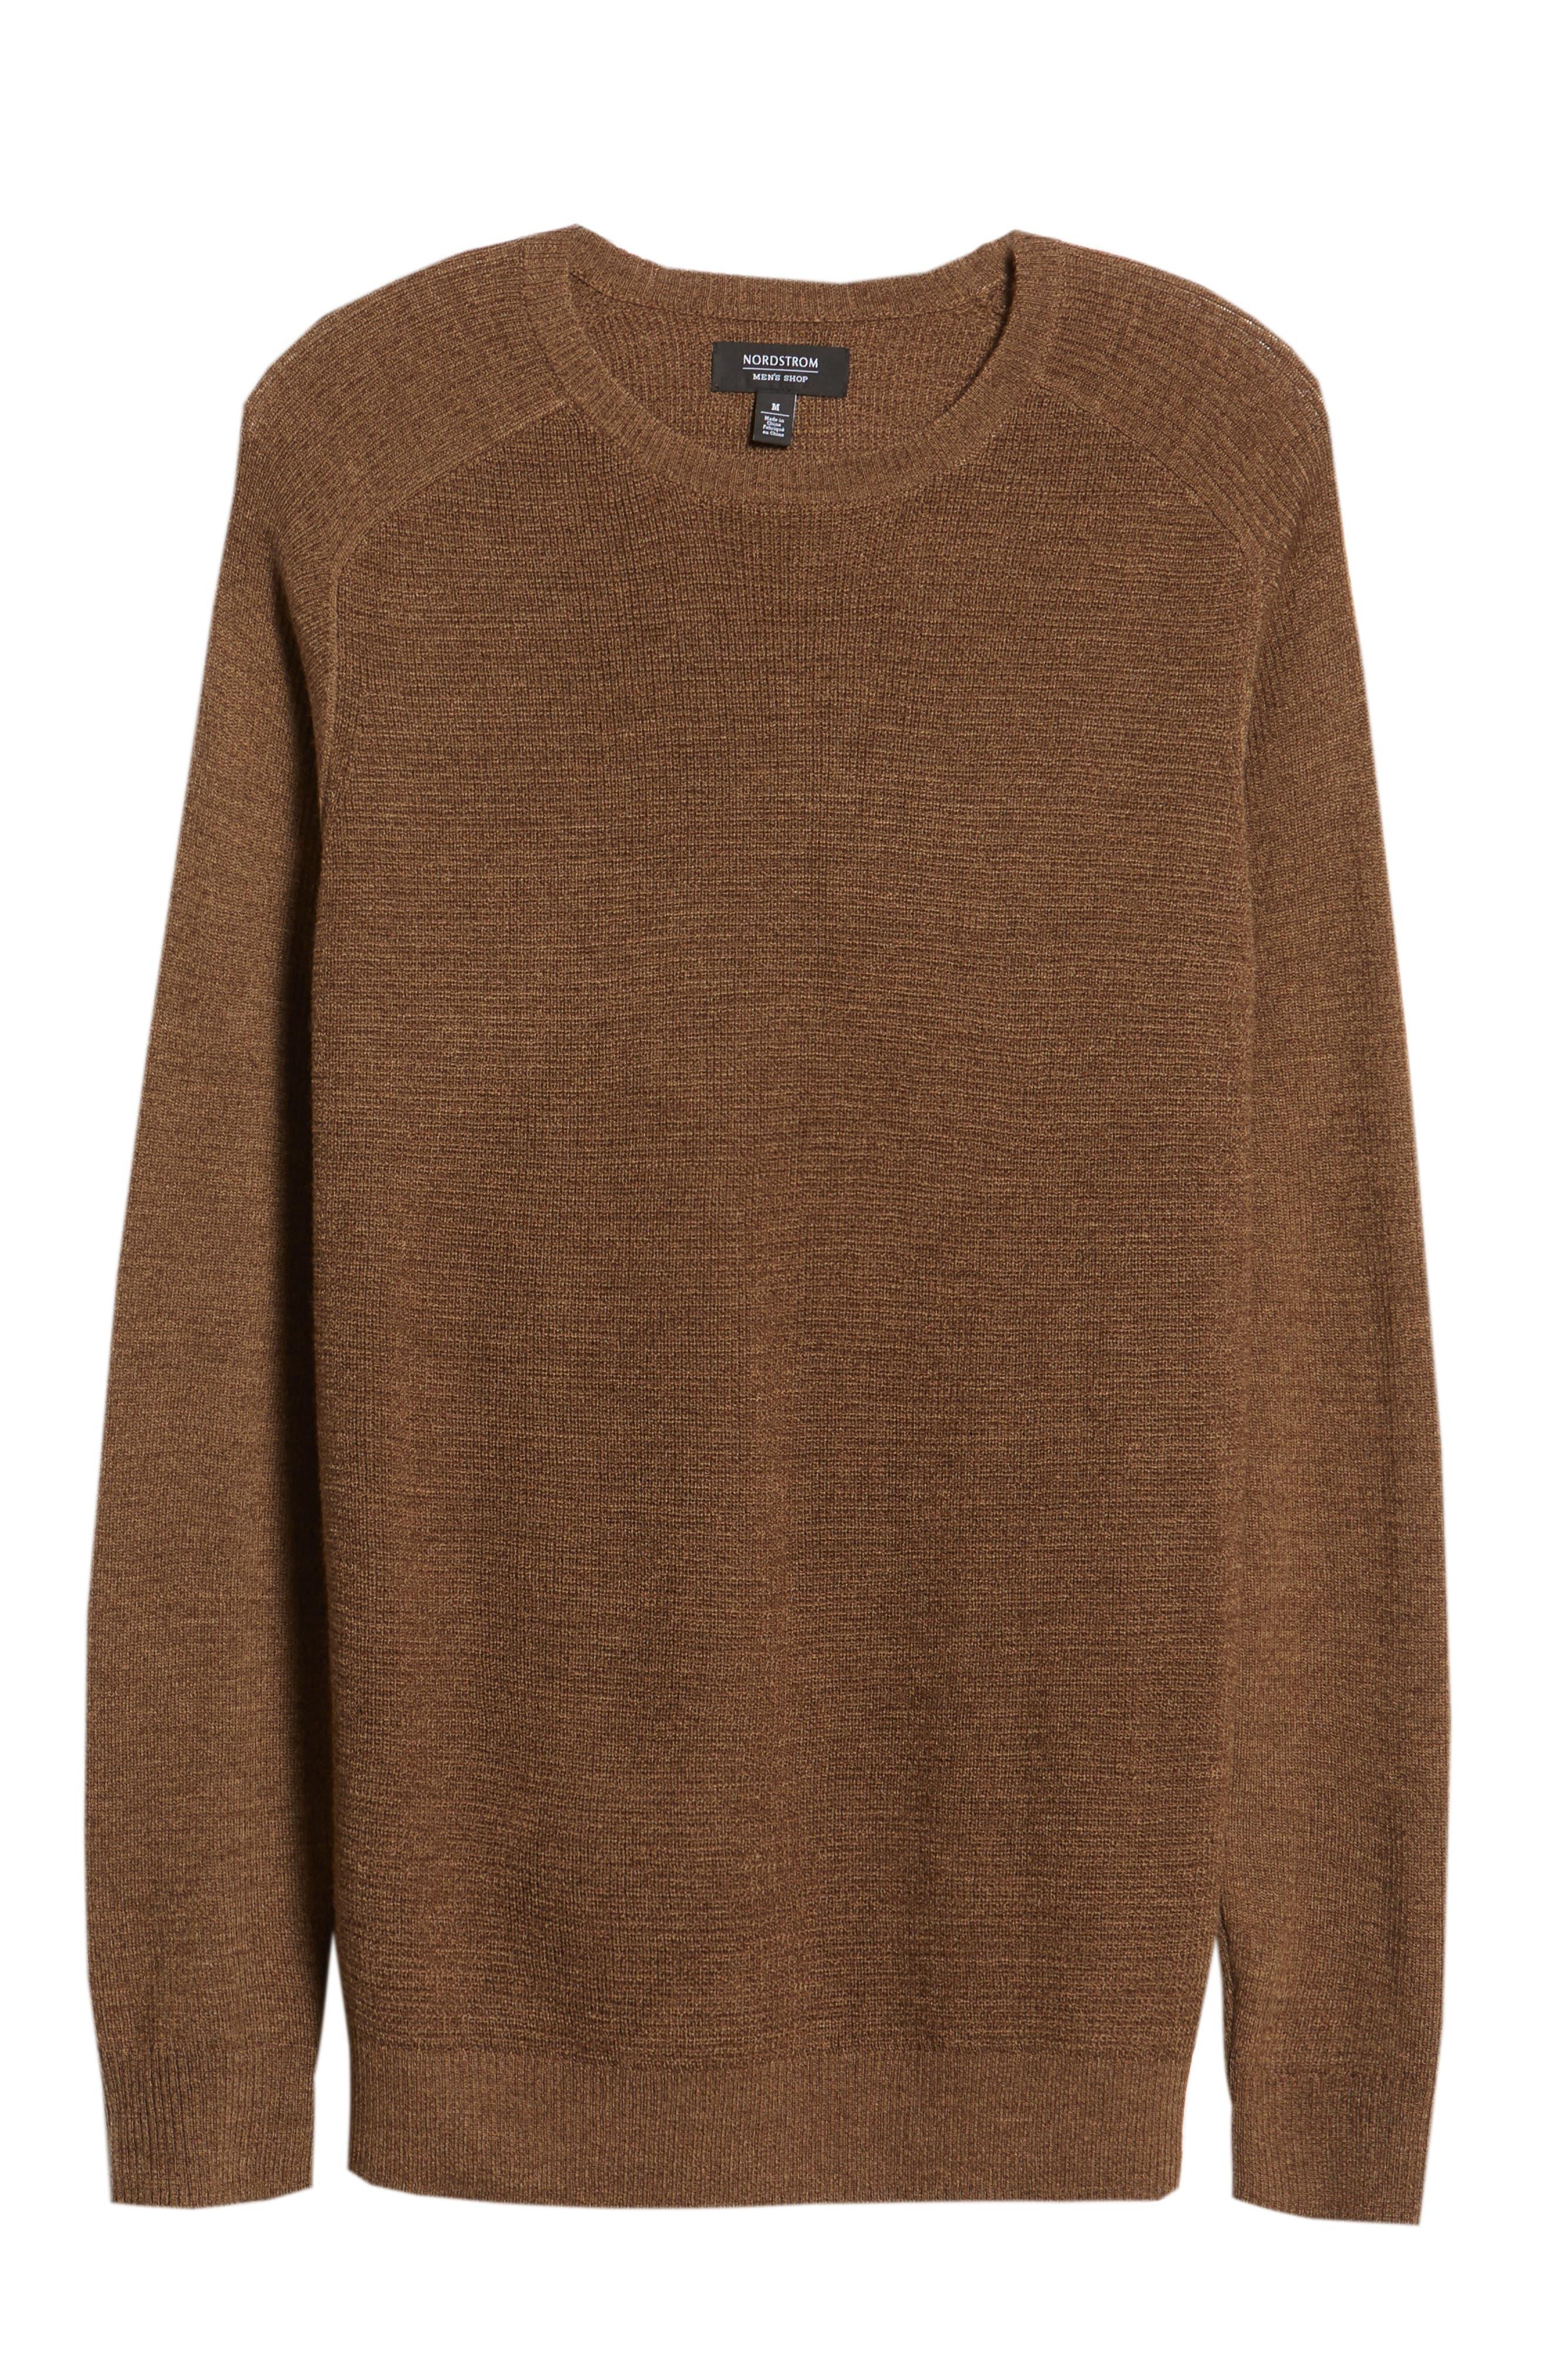 Crewneck Wool Blend Sweater,                             Alternate thumbnail 6, color,                             BROWN MAJOR